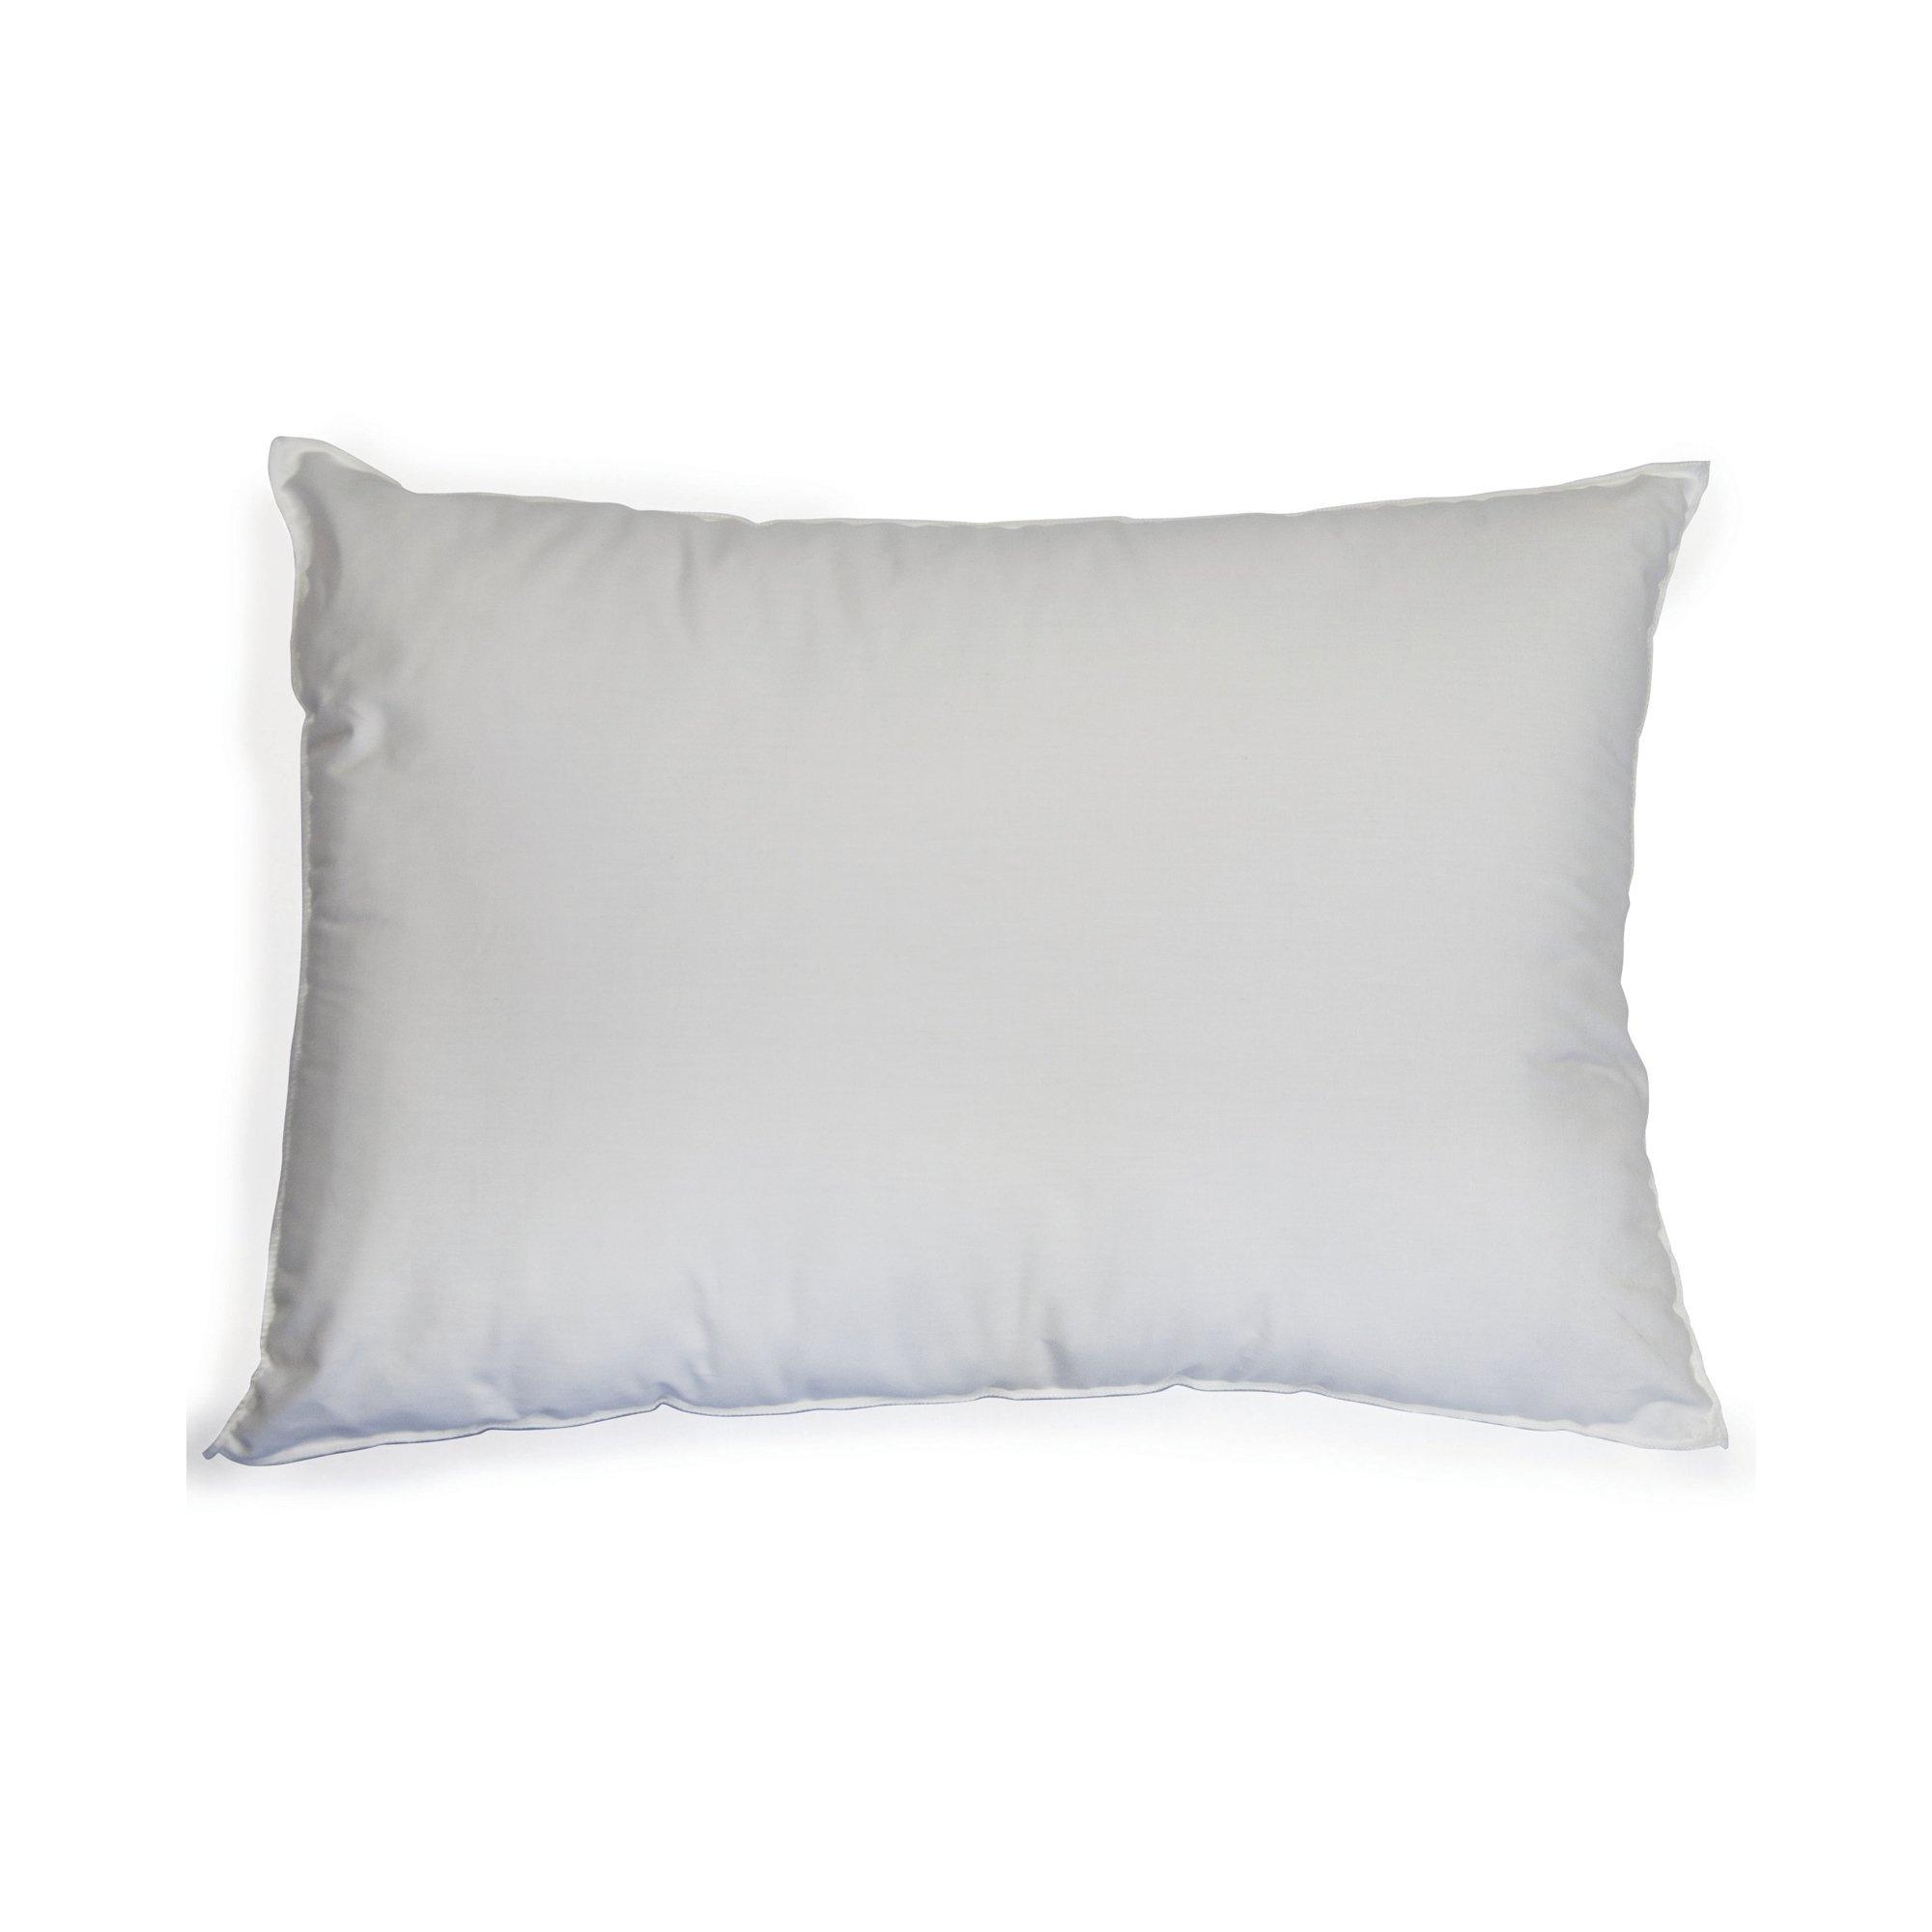 "McKesson Bed Pillow, 41-2127-WS, White (21 X 27"") - 1 Each"